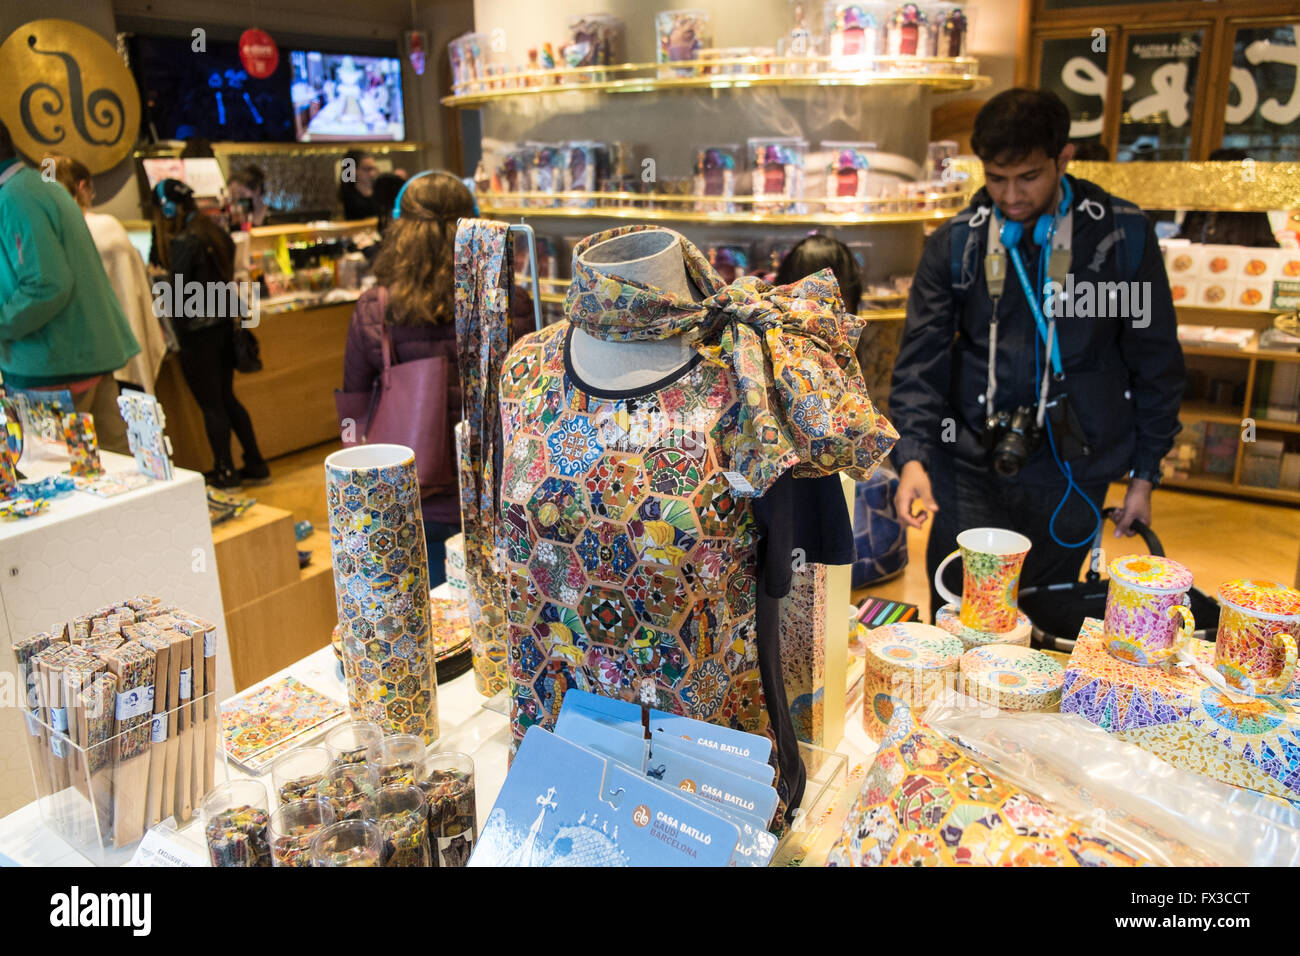 11624351fa006 Tourists at gift shop buying souvenir in antoni gaudi casa batllo jpg  1300x956 Gaudi shop